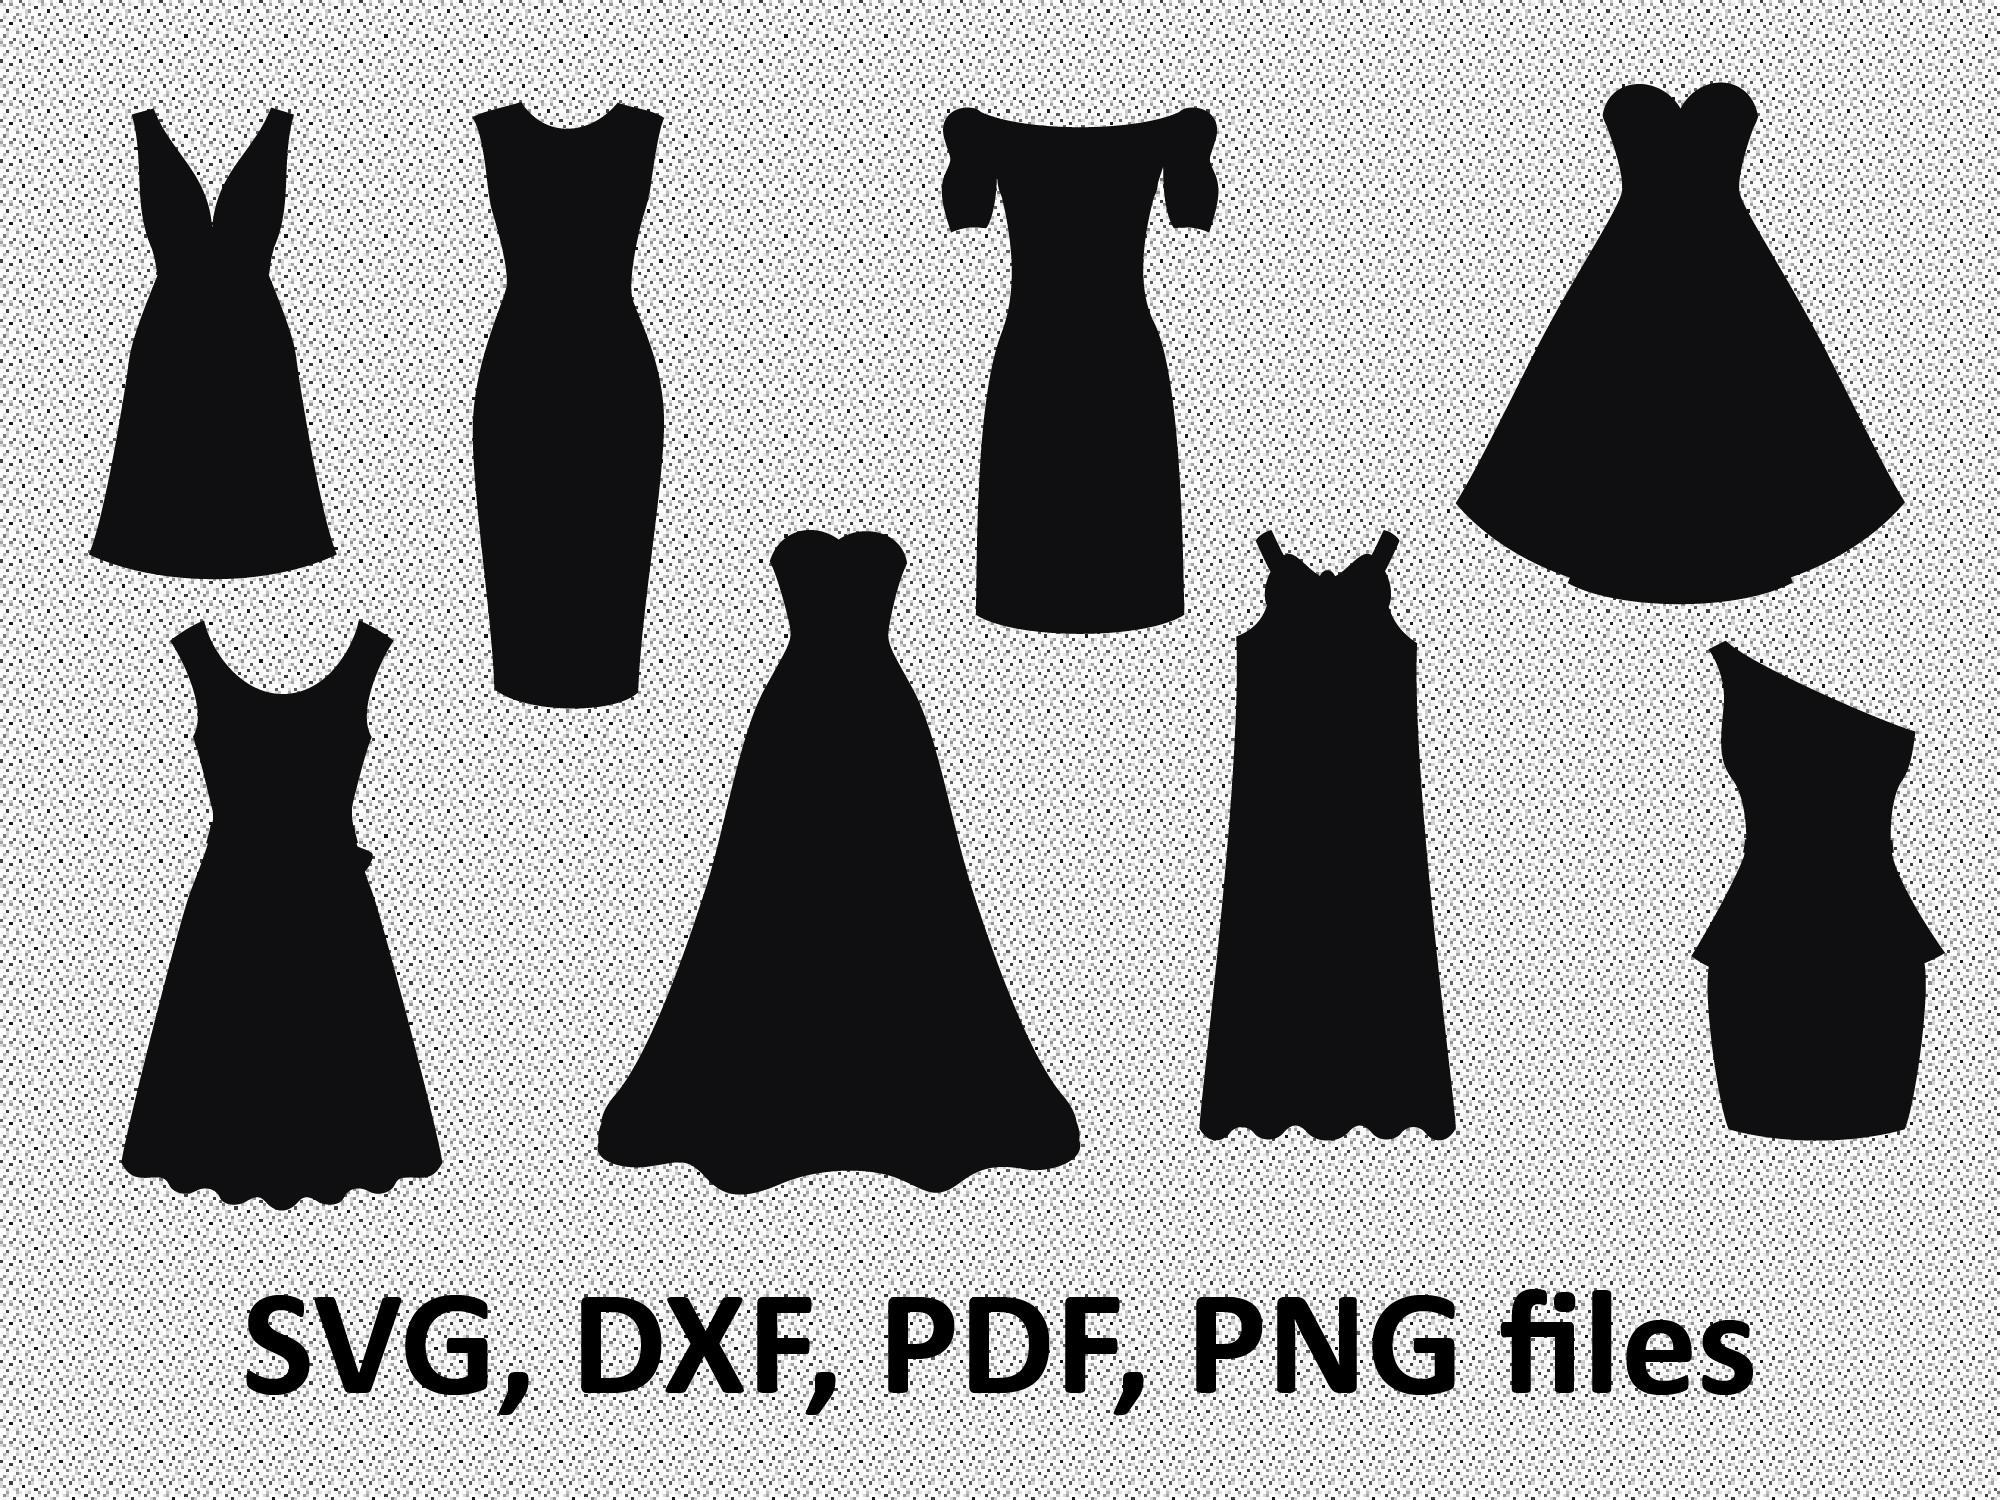 2000x1500 Dress Svg Dress Dxf Dress Clipart Dress Files Printing Etsy